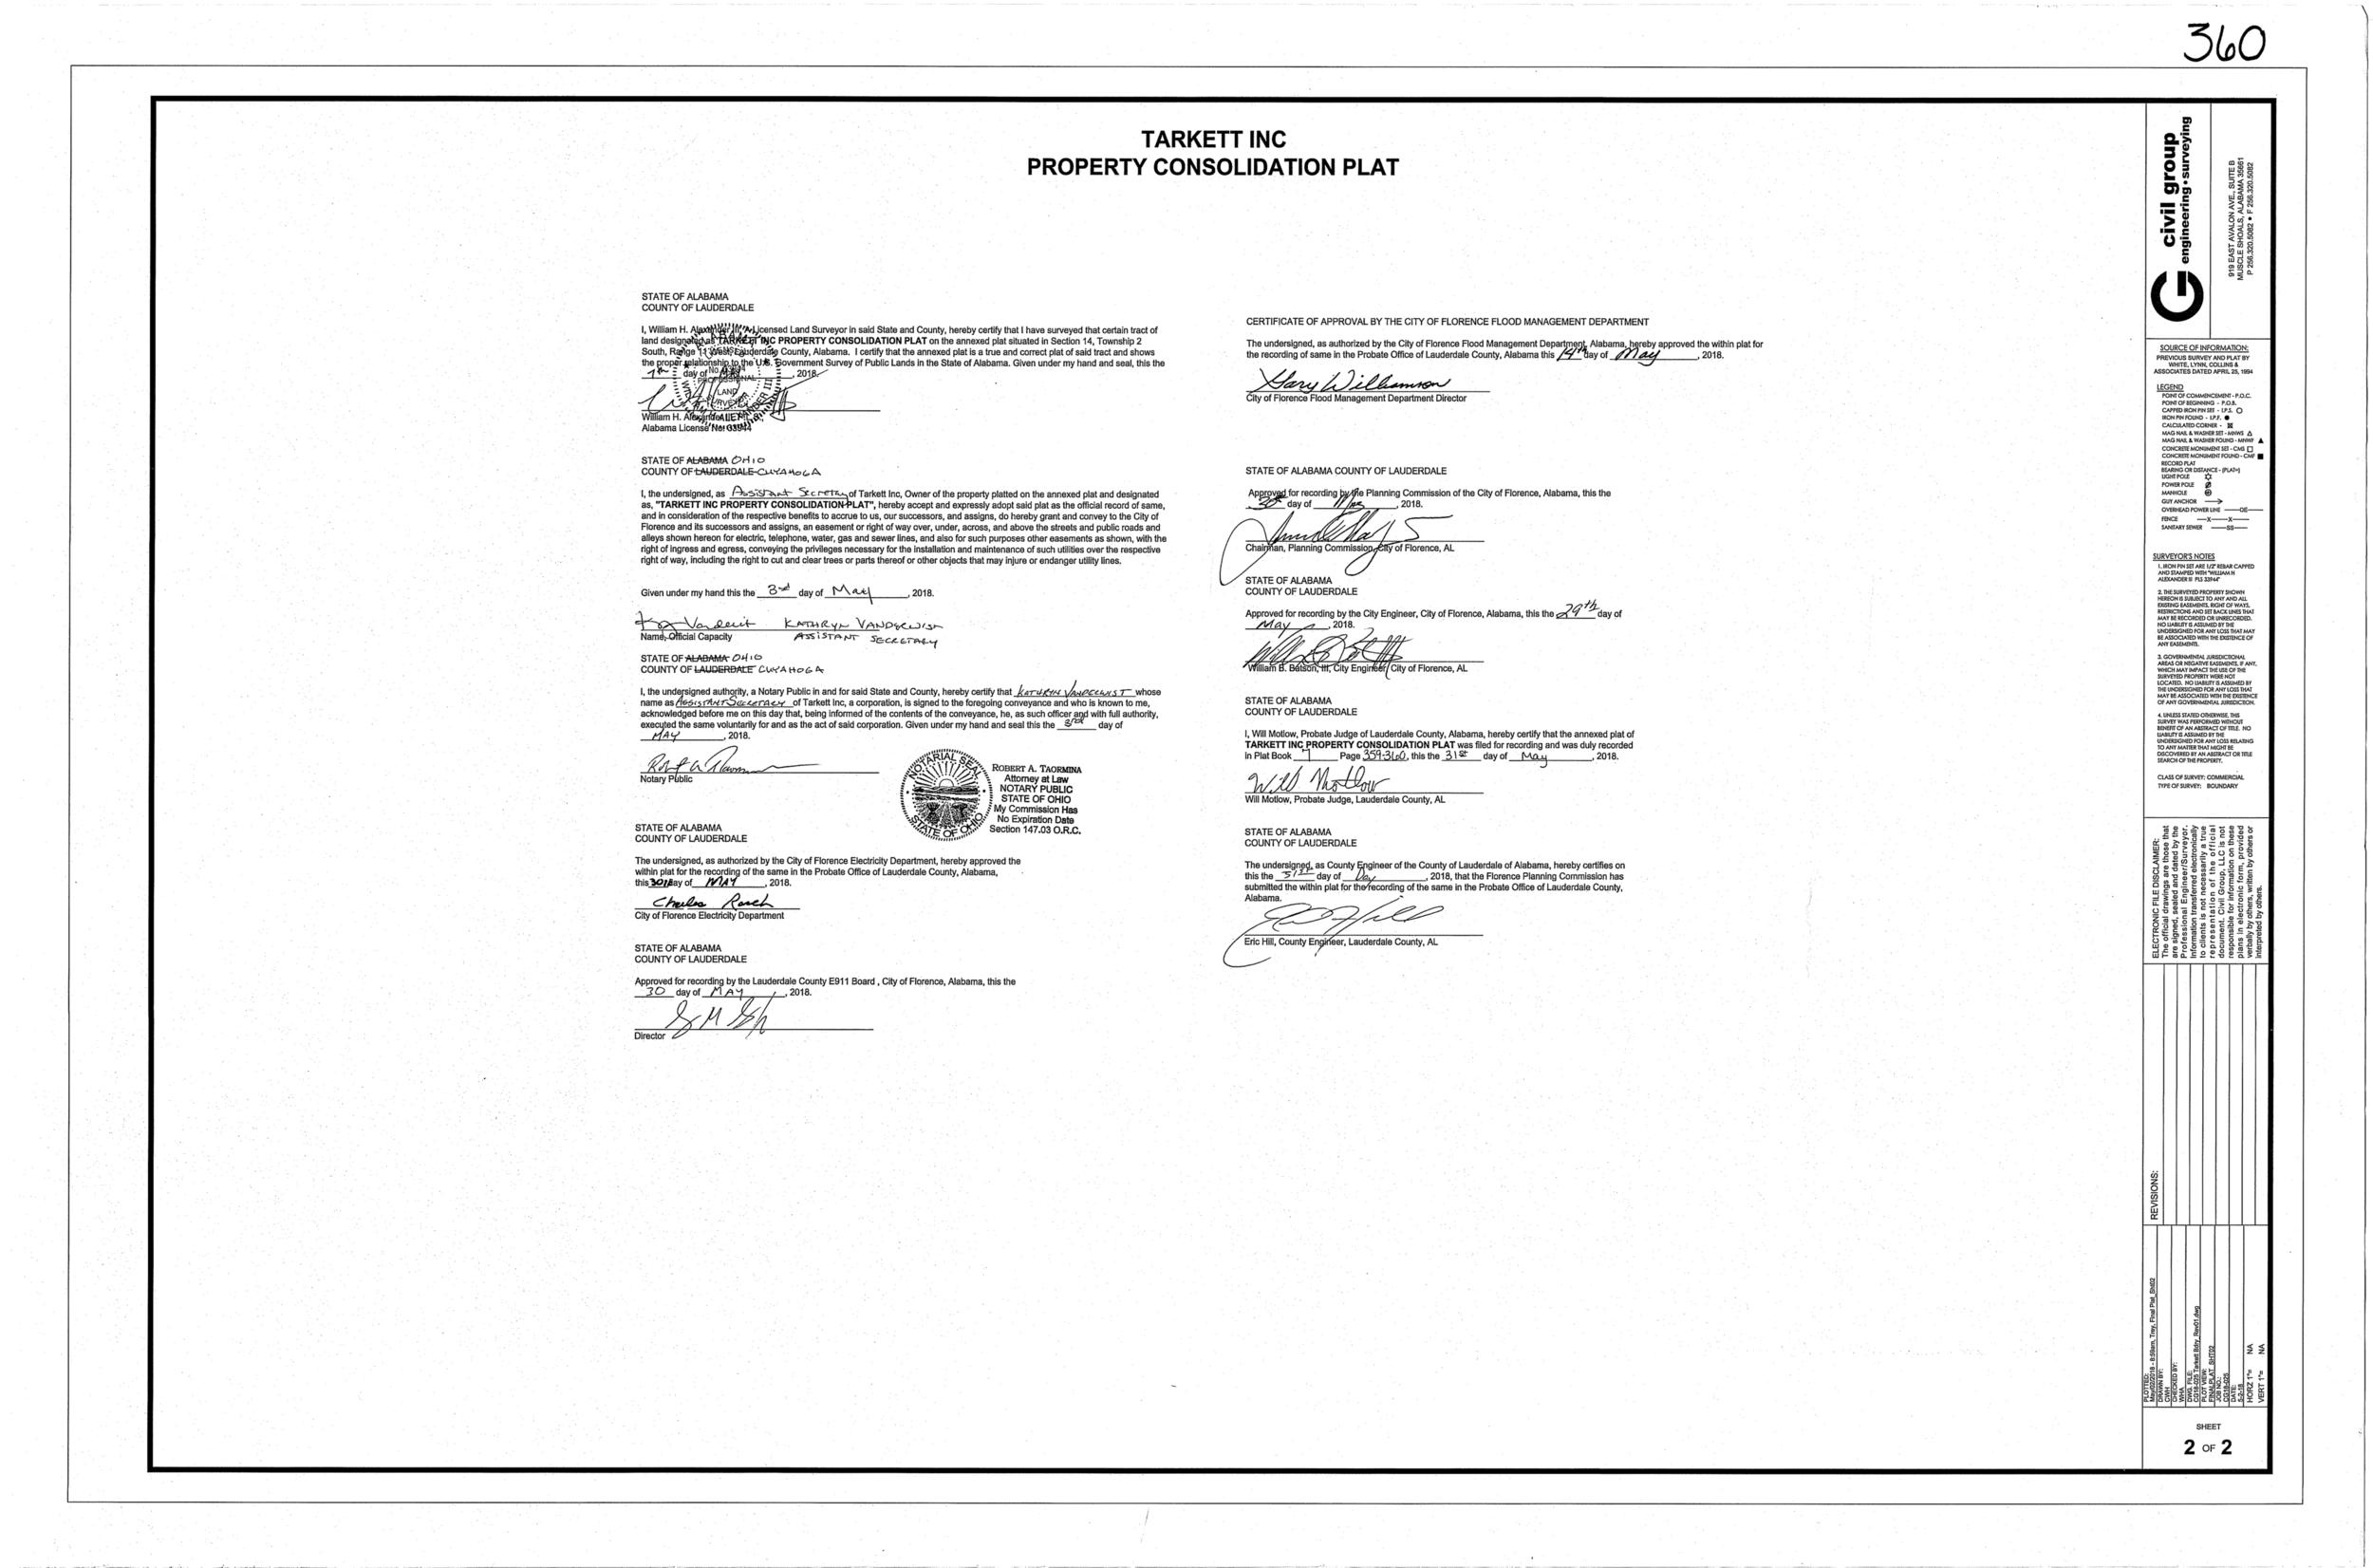 Plat-Tarkett Inc Property Consolidation 2 of 2-1.png